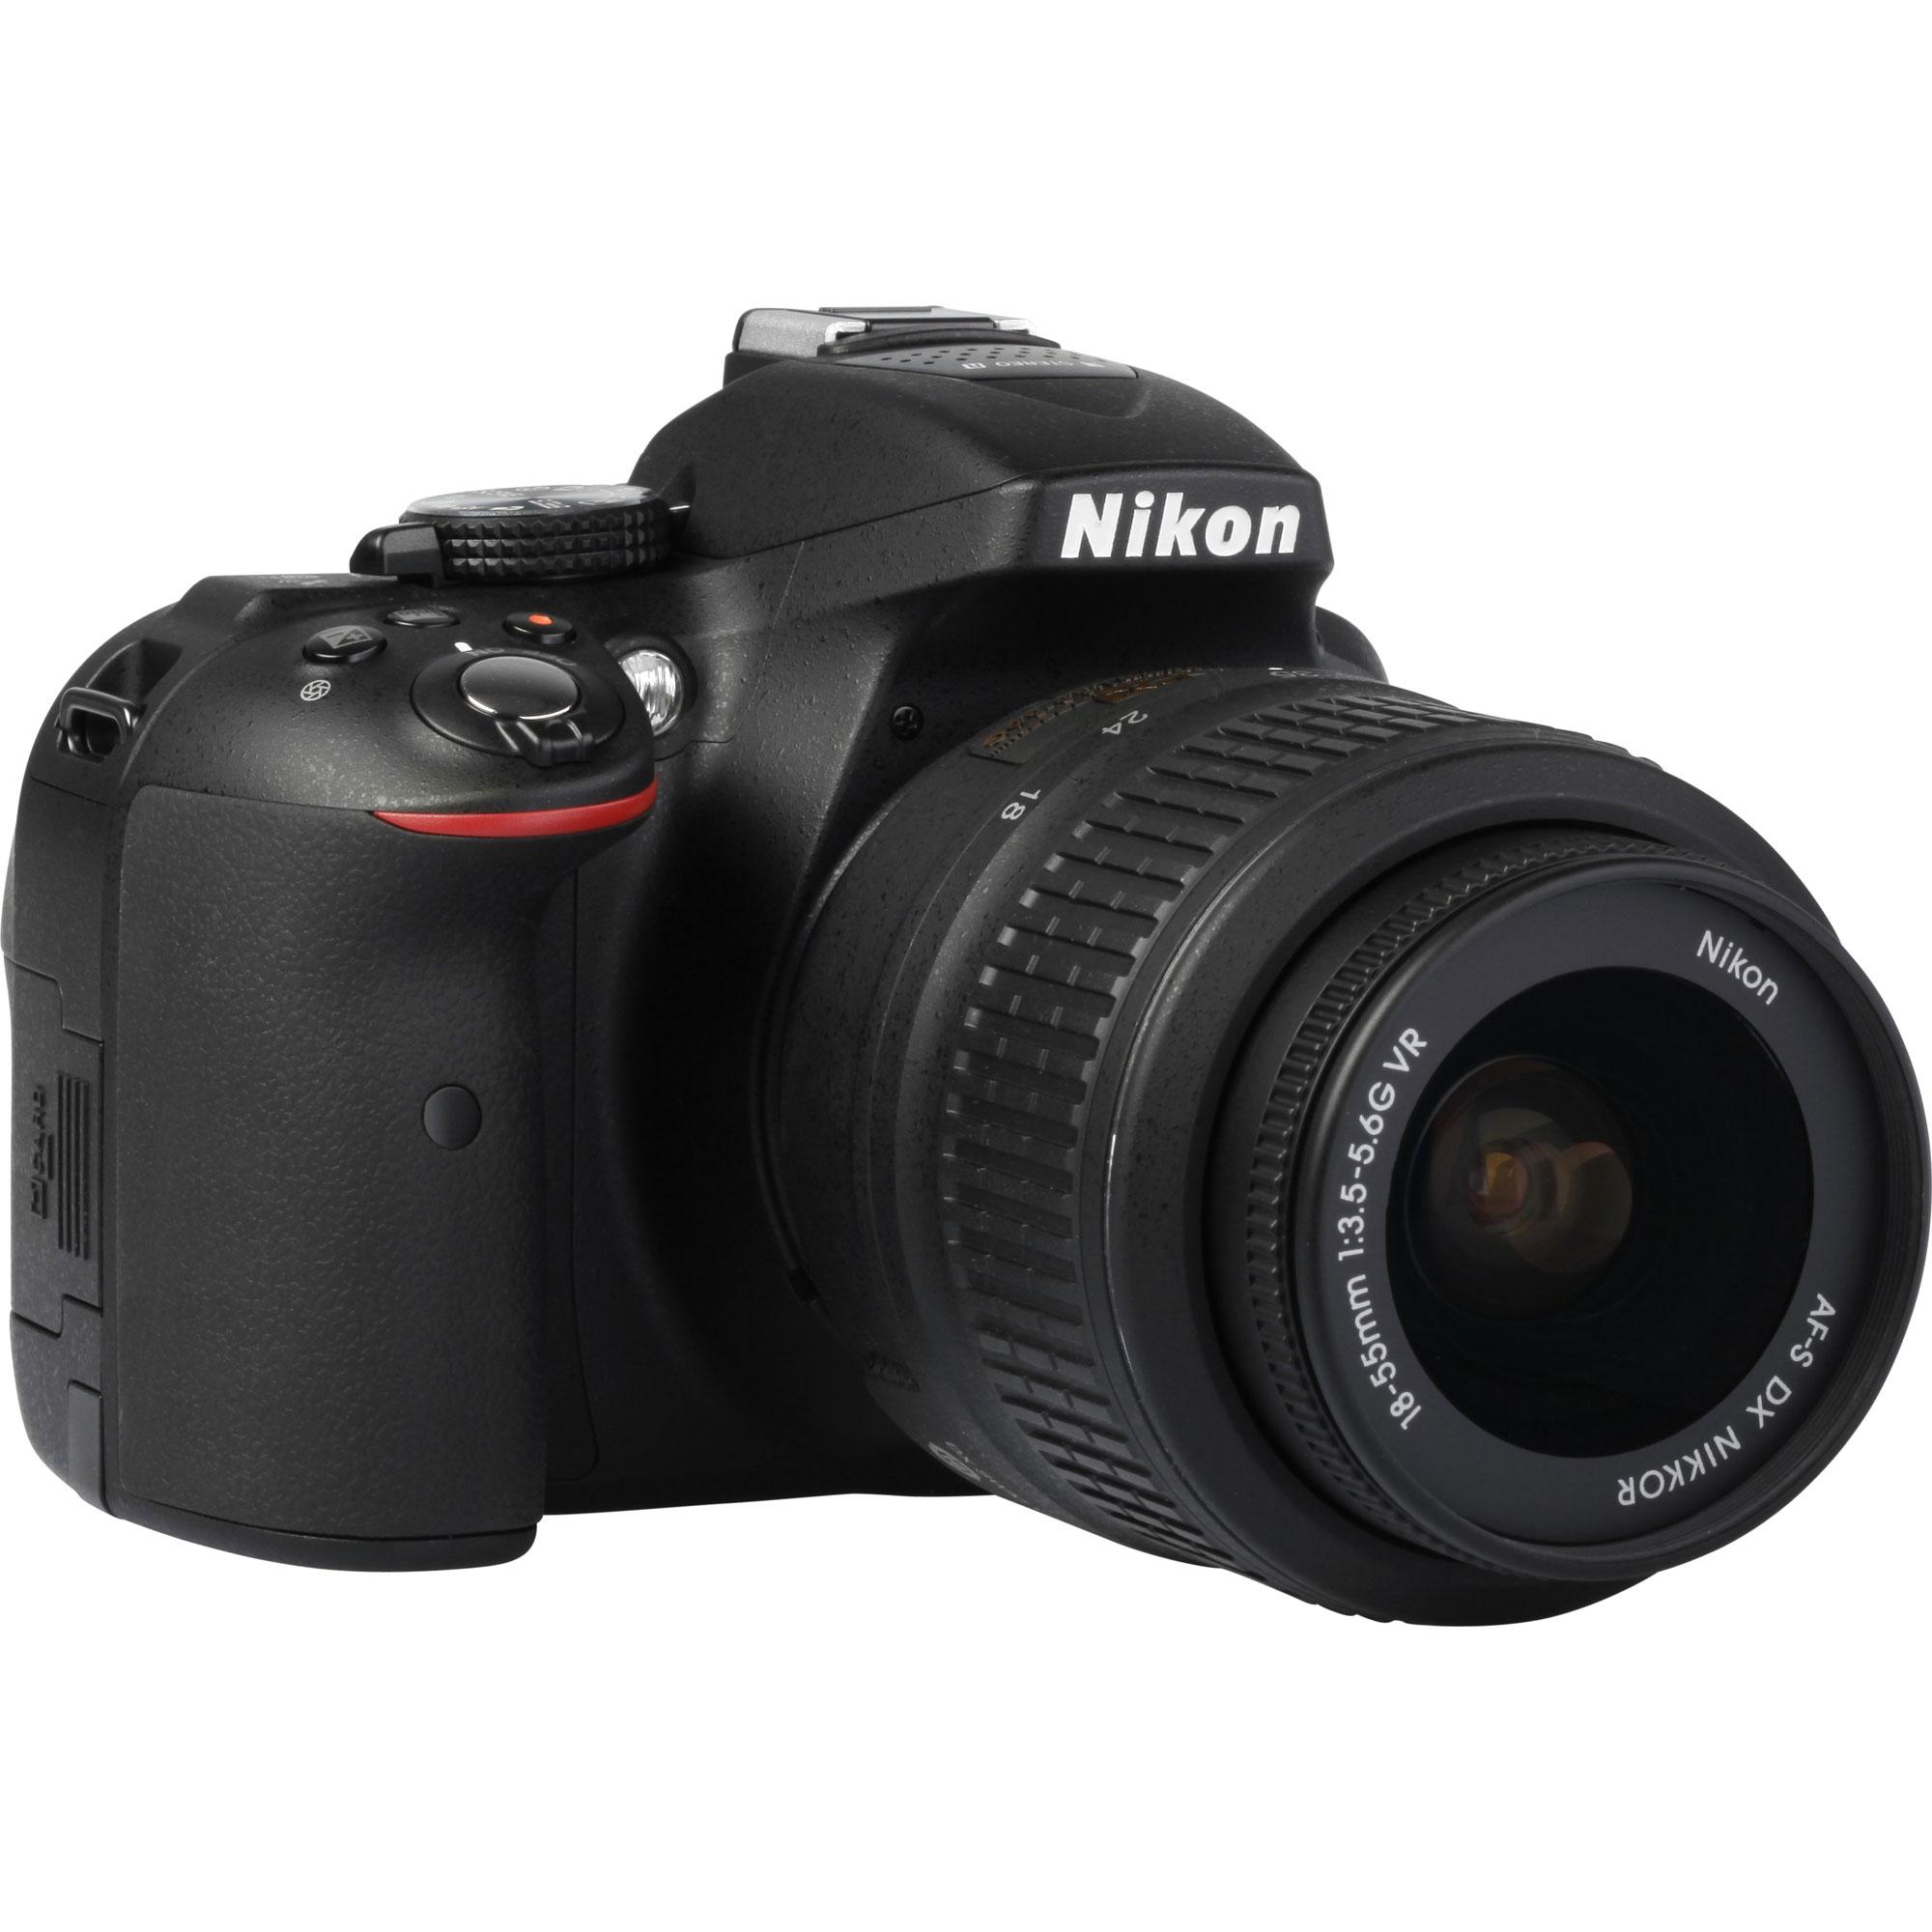 Nikon D5300 + AF-S DX Nikkor 18-55 mm G VR - Vue de 3/4 vers la droite